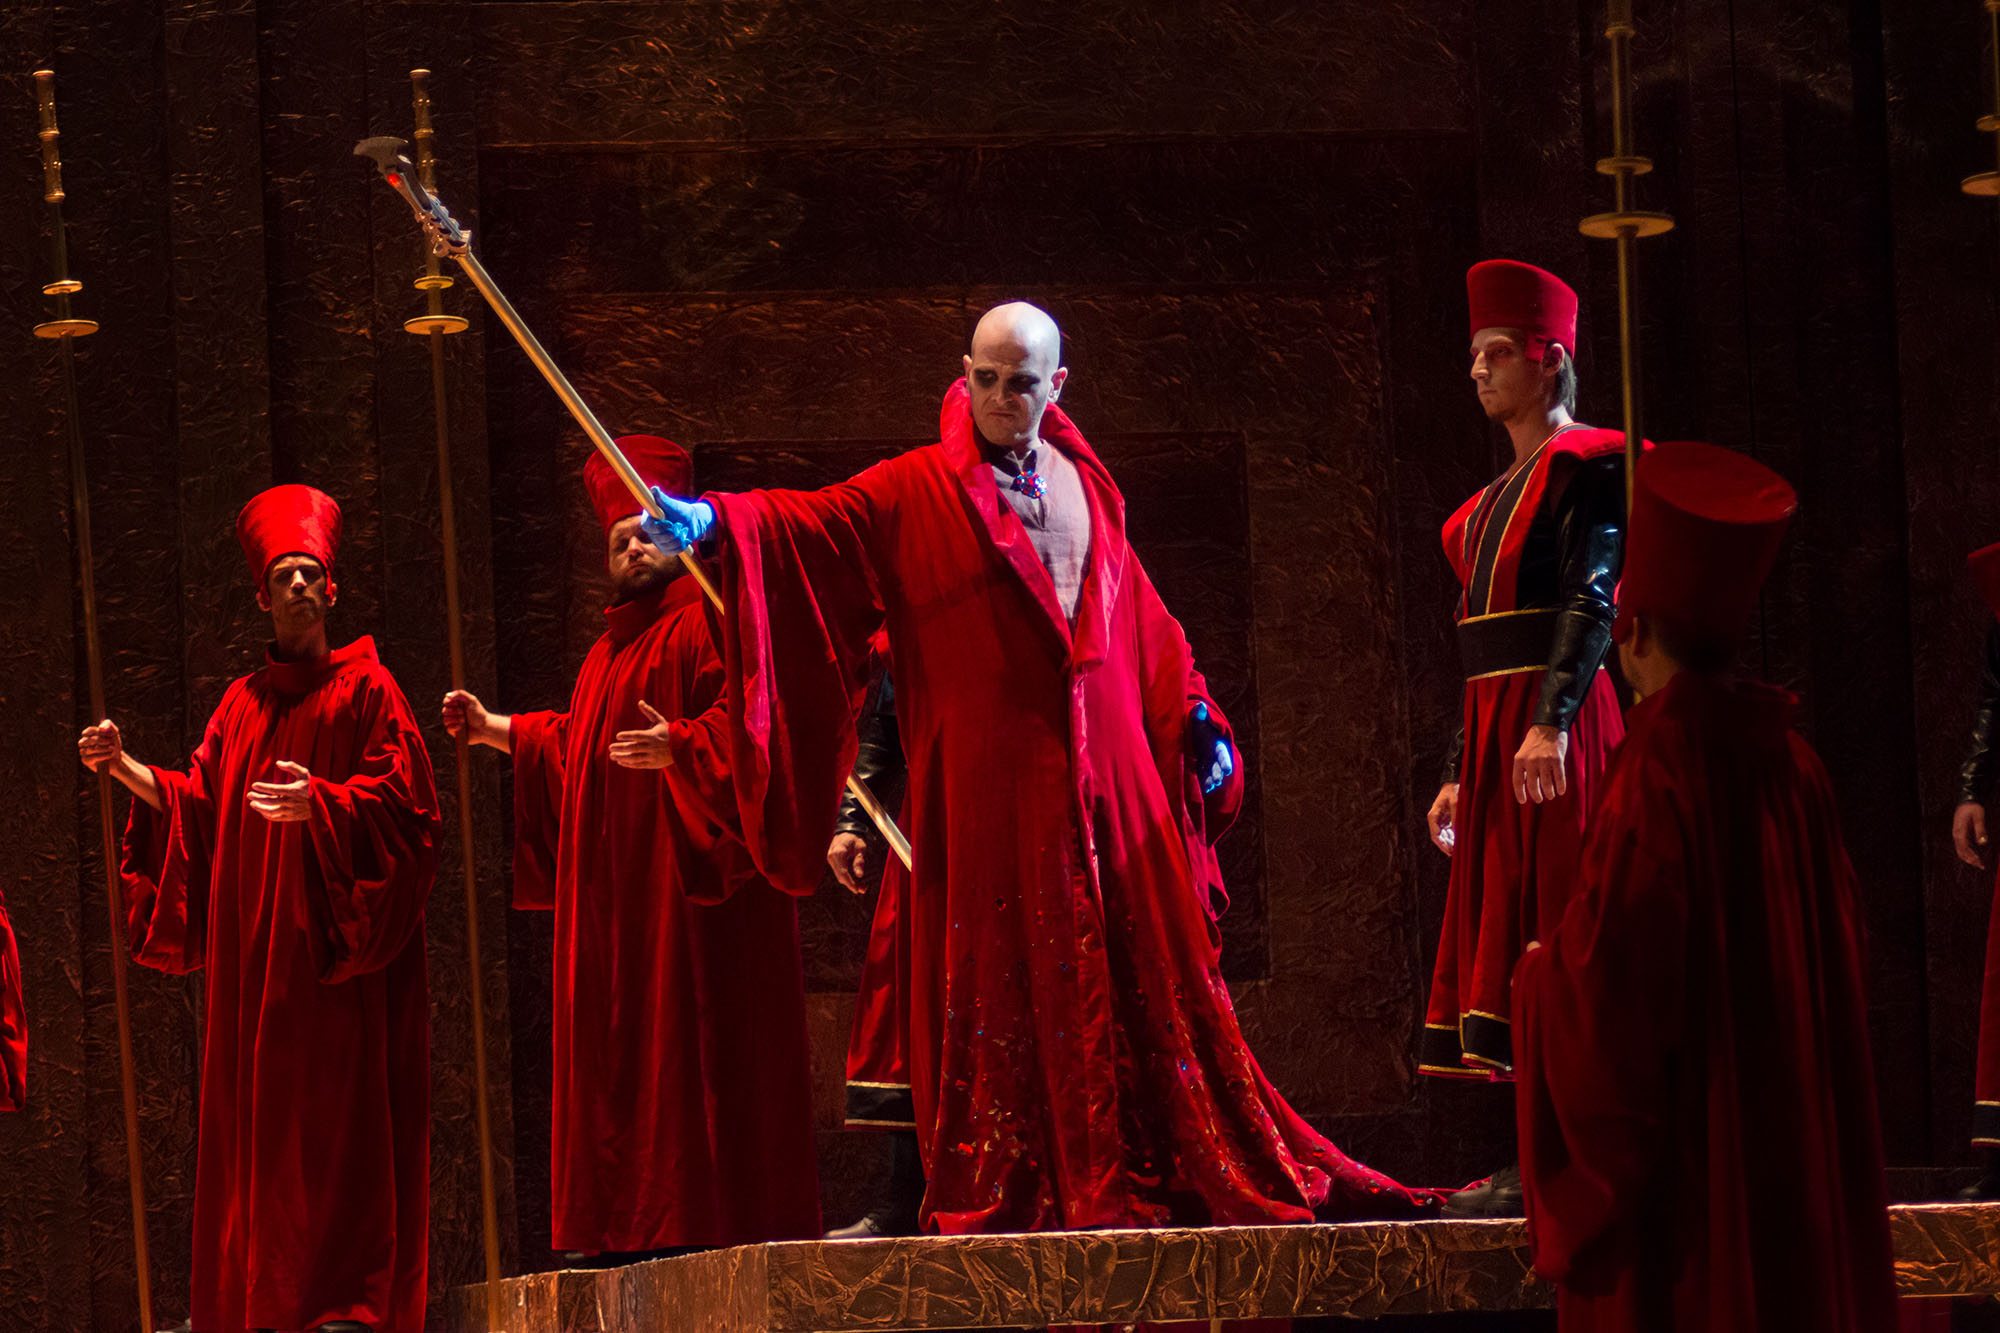 Nabucco al Teatro Verdi di Padova